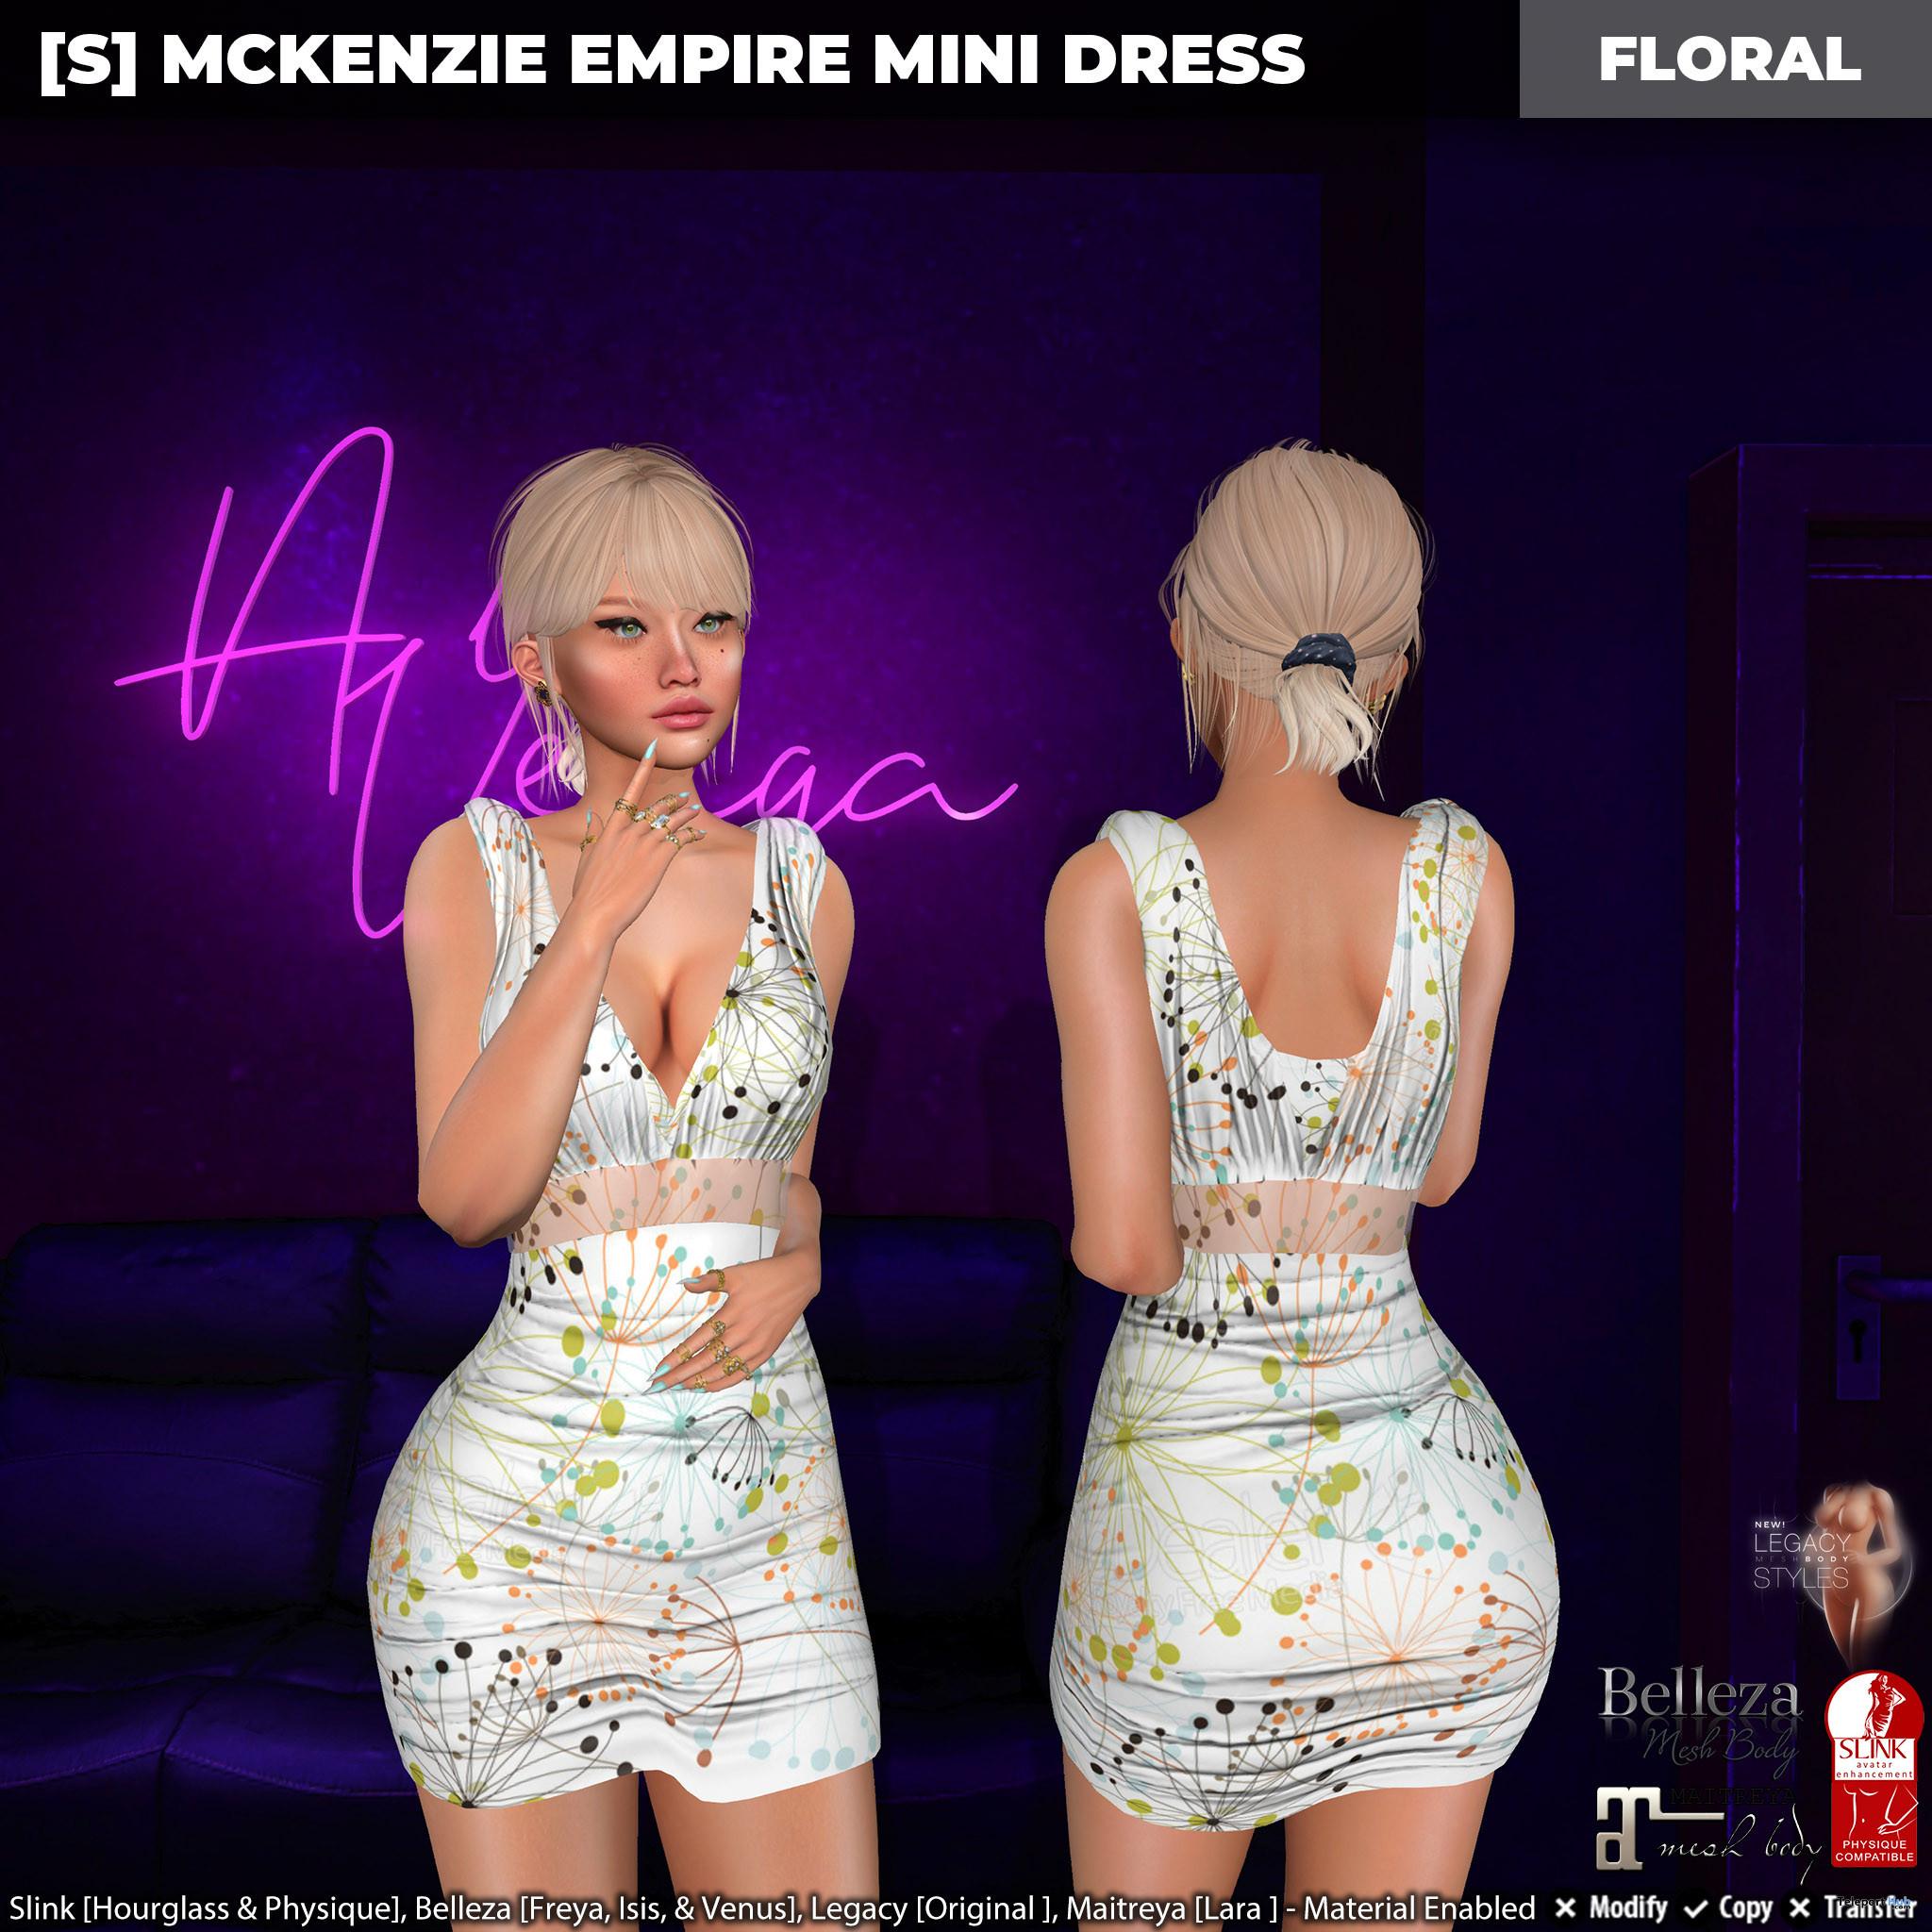 New Release: [S] Mckenzie Empire Mini Dress by [satus Inc] - Teleport Hub - teleporthub.com